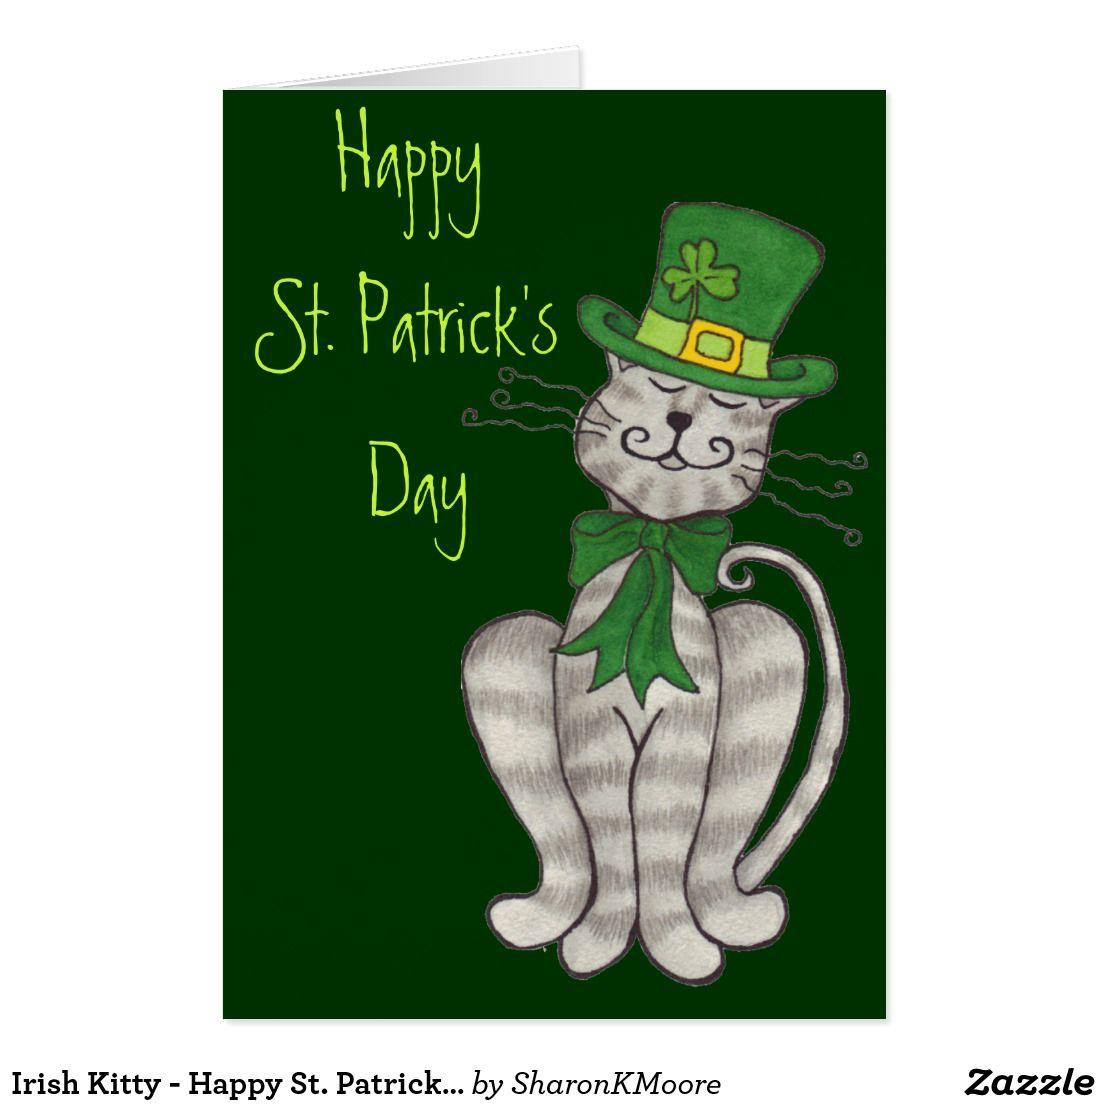 Irish Kitty Happy St Patrick S Day Card Zazzle Com In 2021 St Patricks Day Clipart Happy St Patricks Day Cards